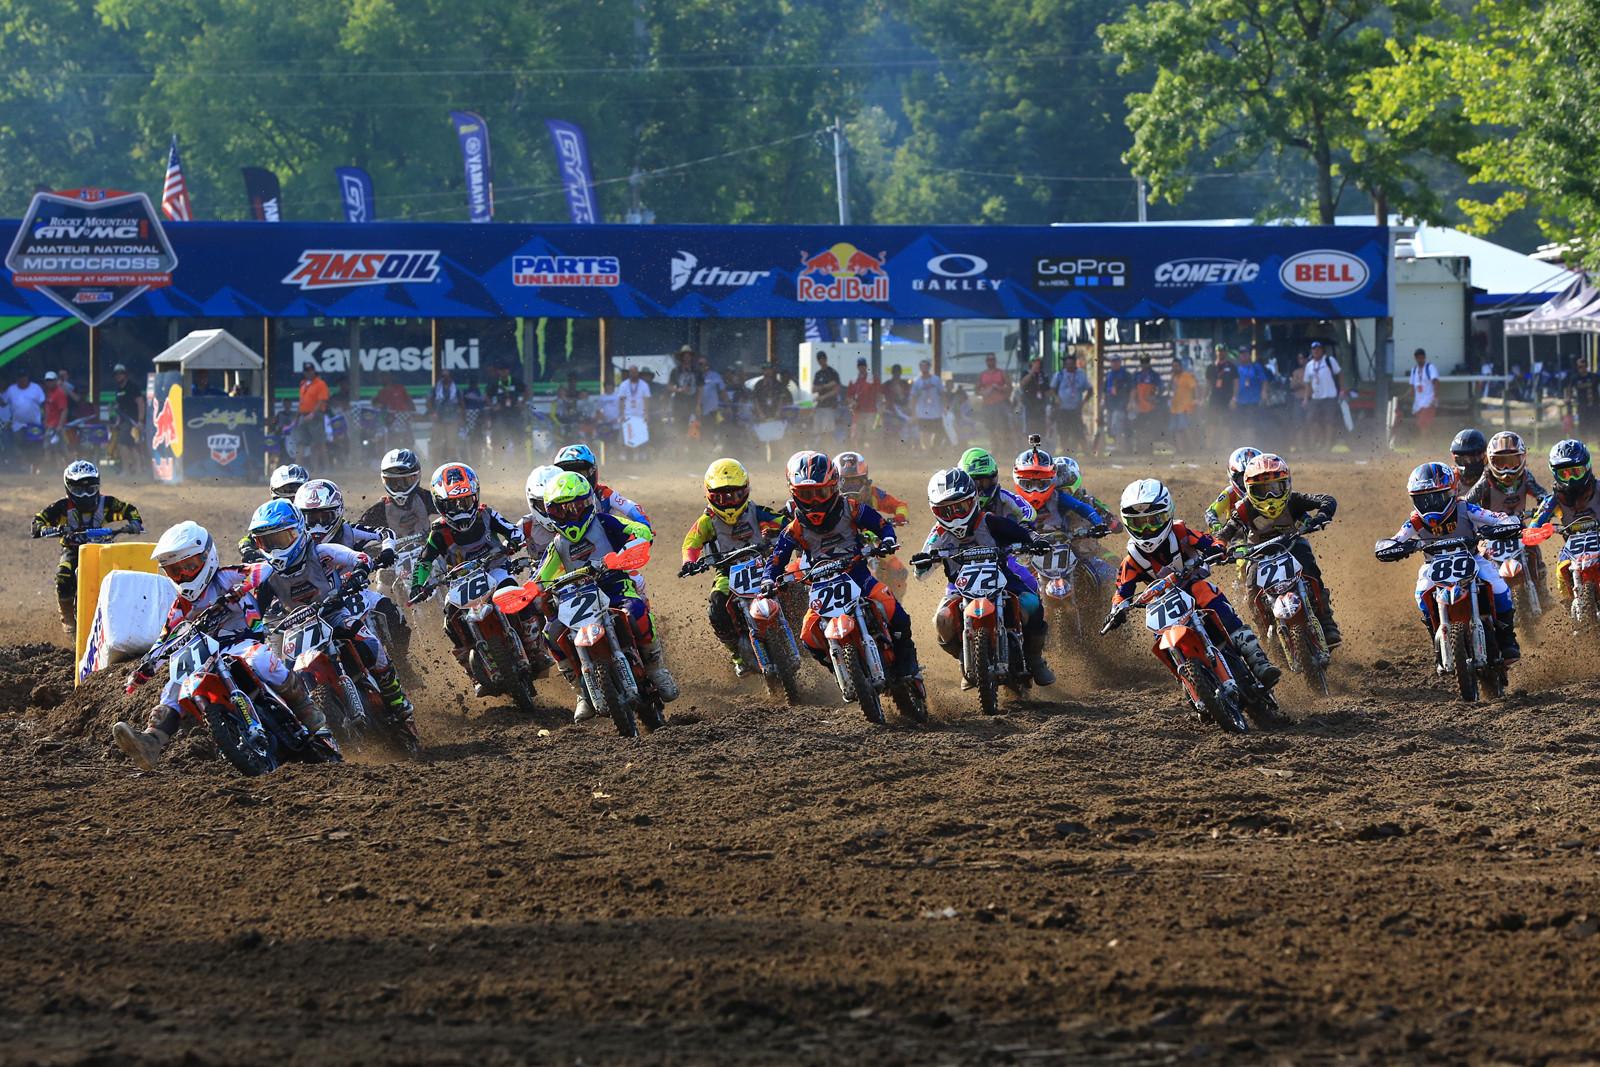 65cc 10-11 - Photo Blast: Loretta's Day 2 - Motocross Pictures - Vital MX